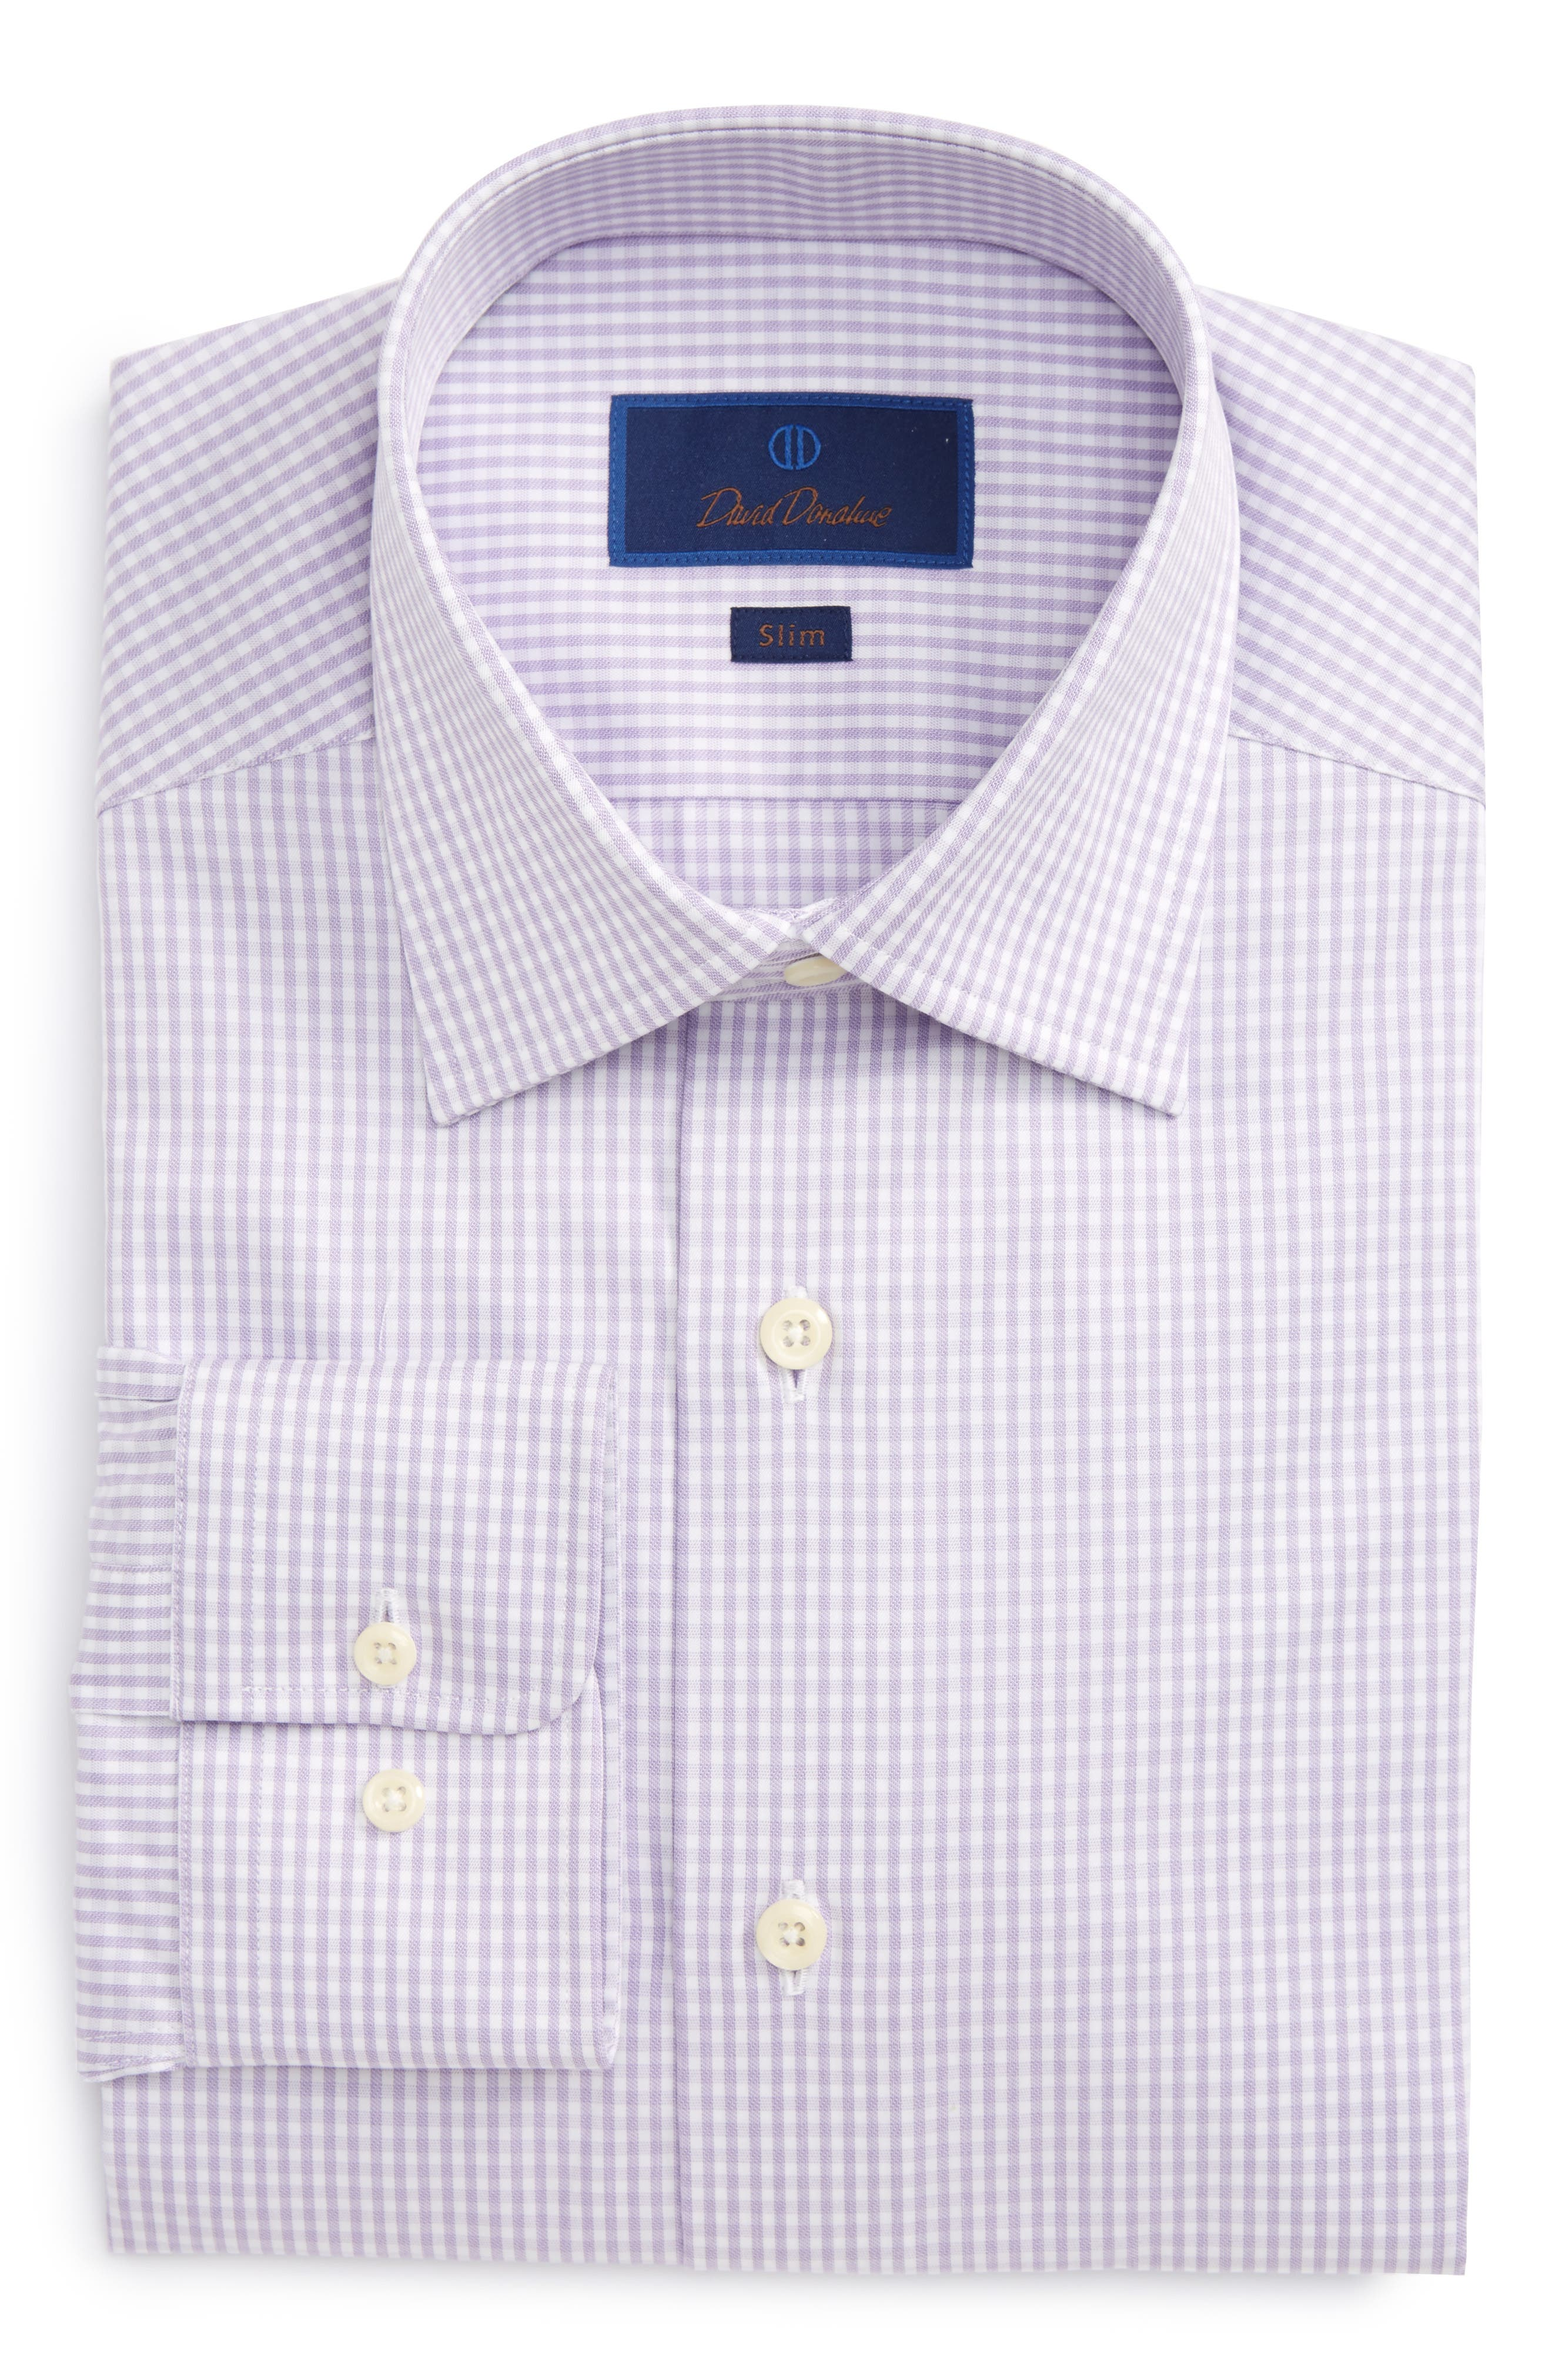 Main Image - David Donahue Slim Fit Check Dress Shirt